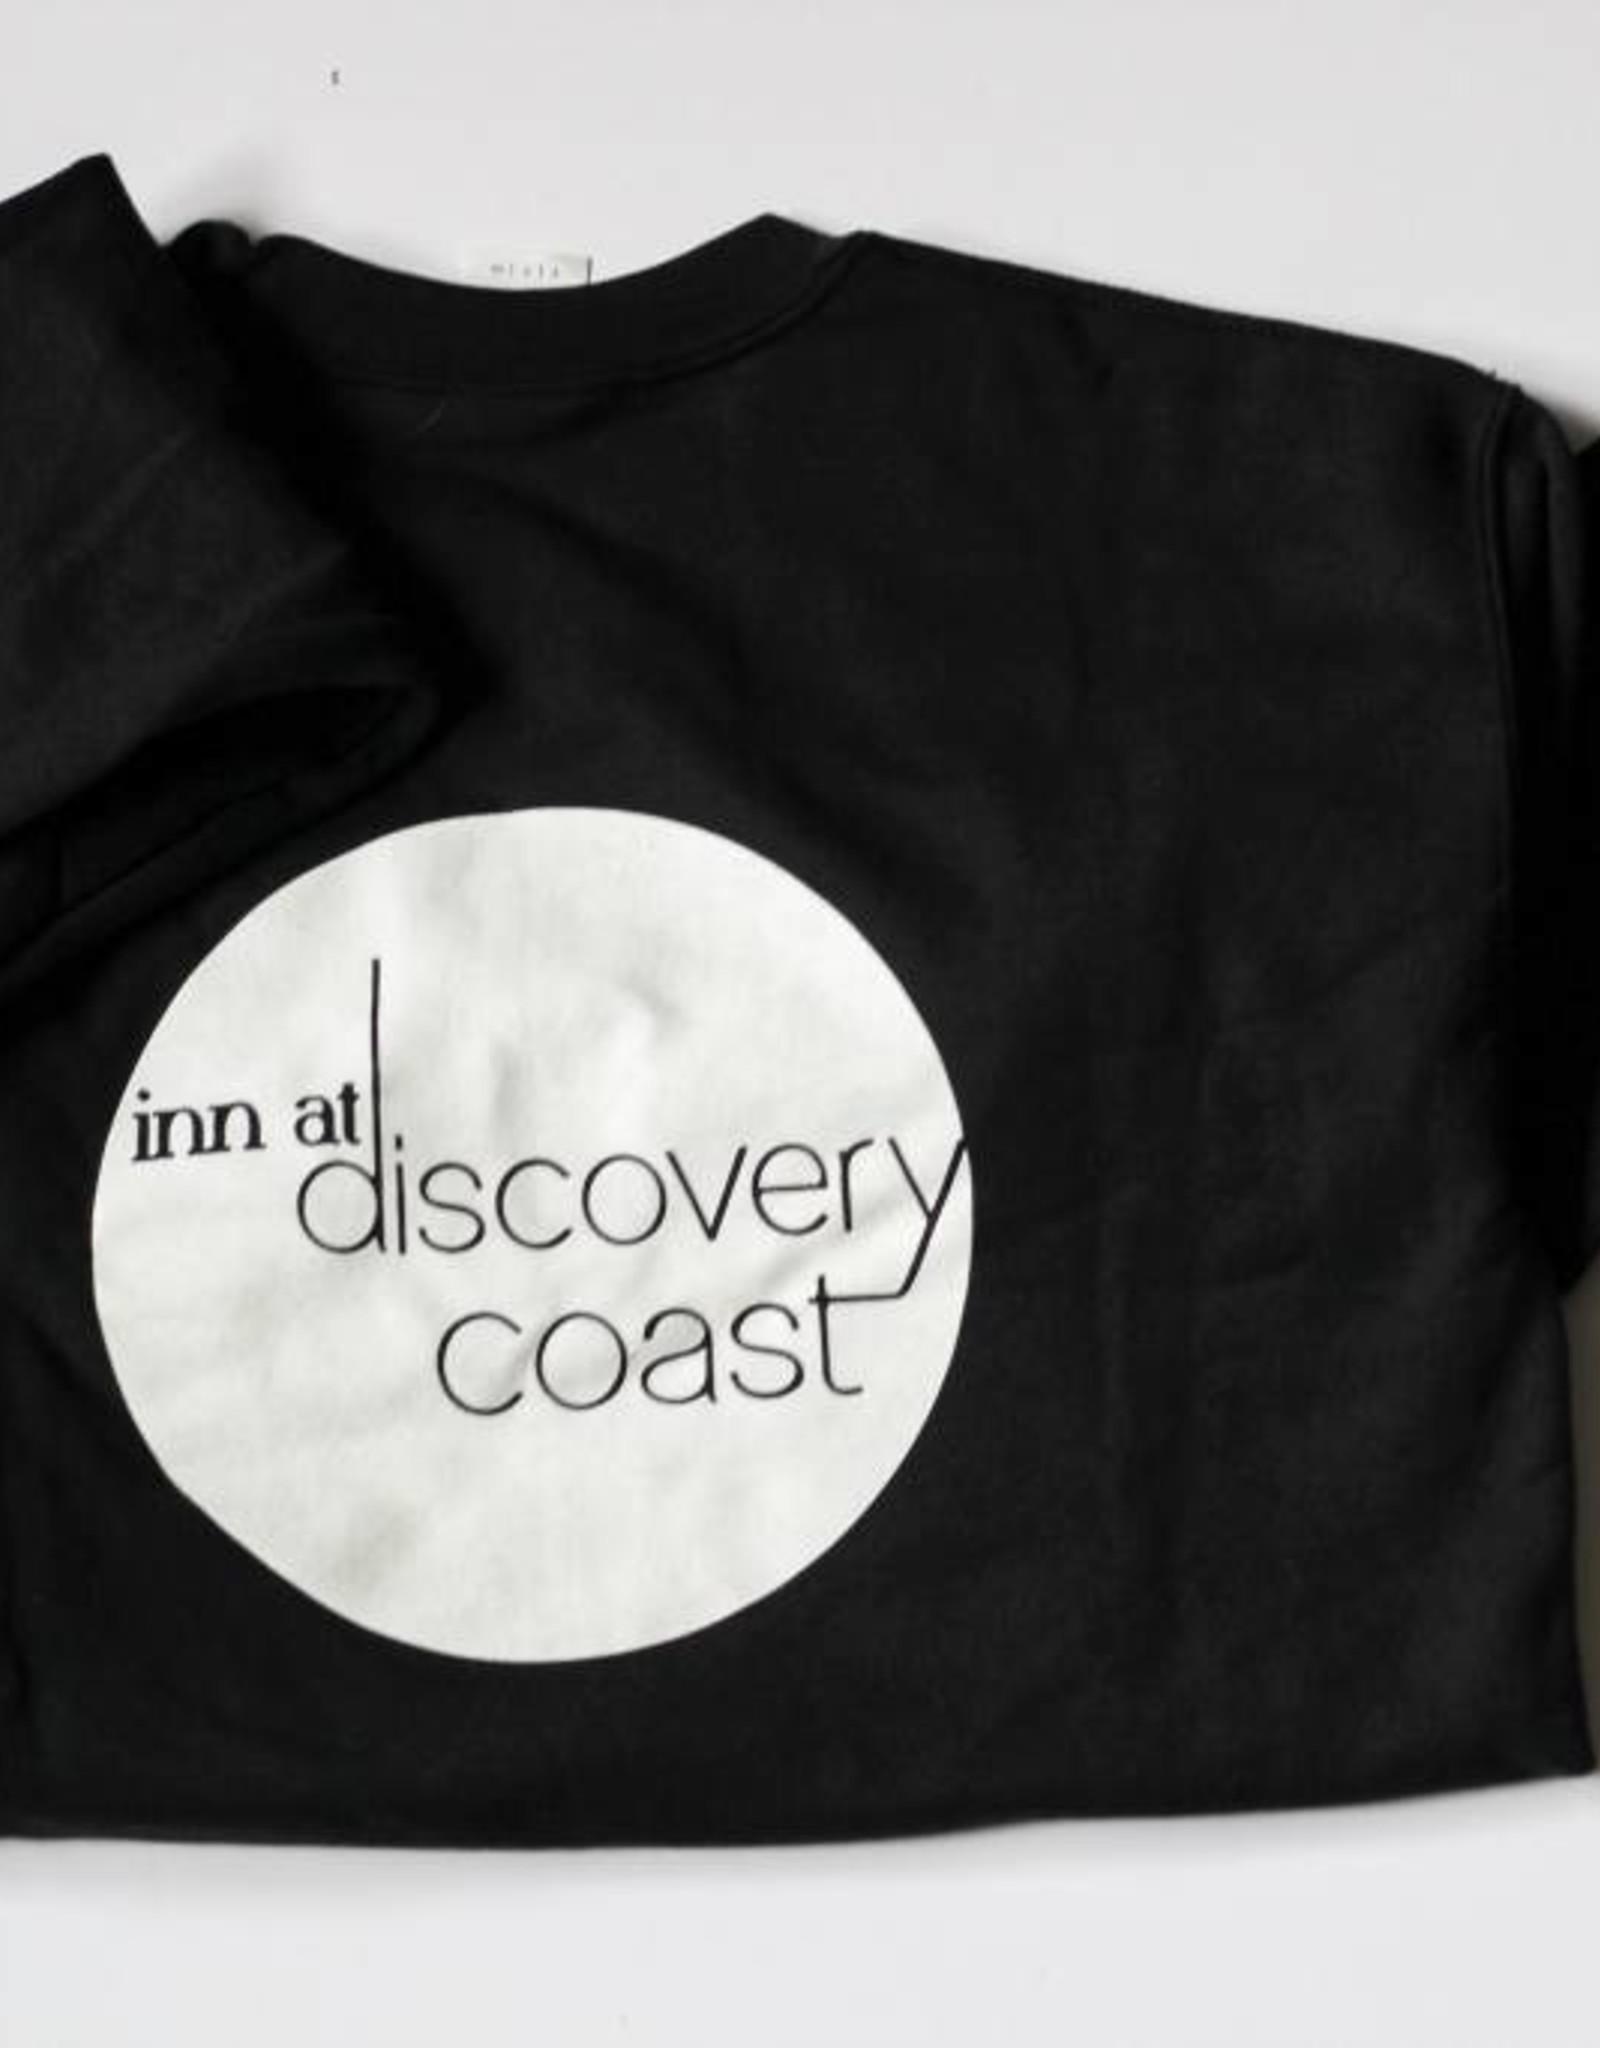 Inn at Discovery Coast Crew Neck